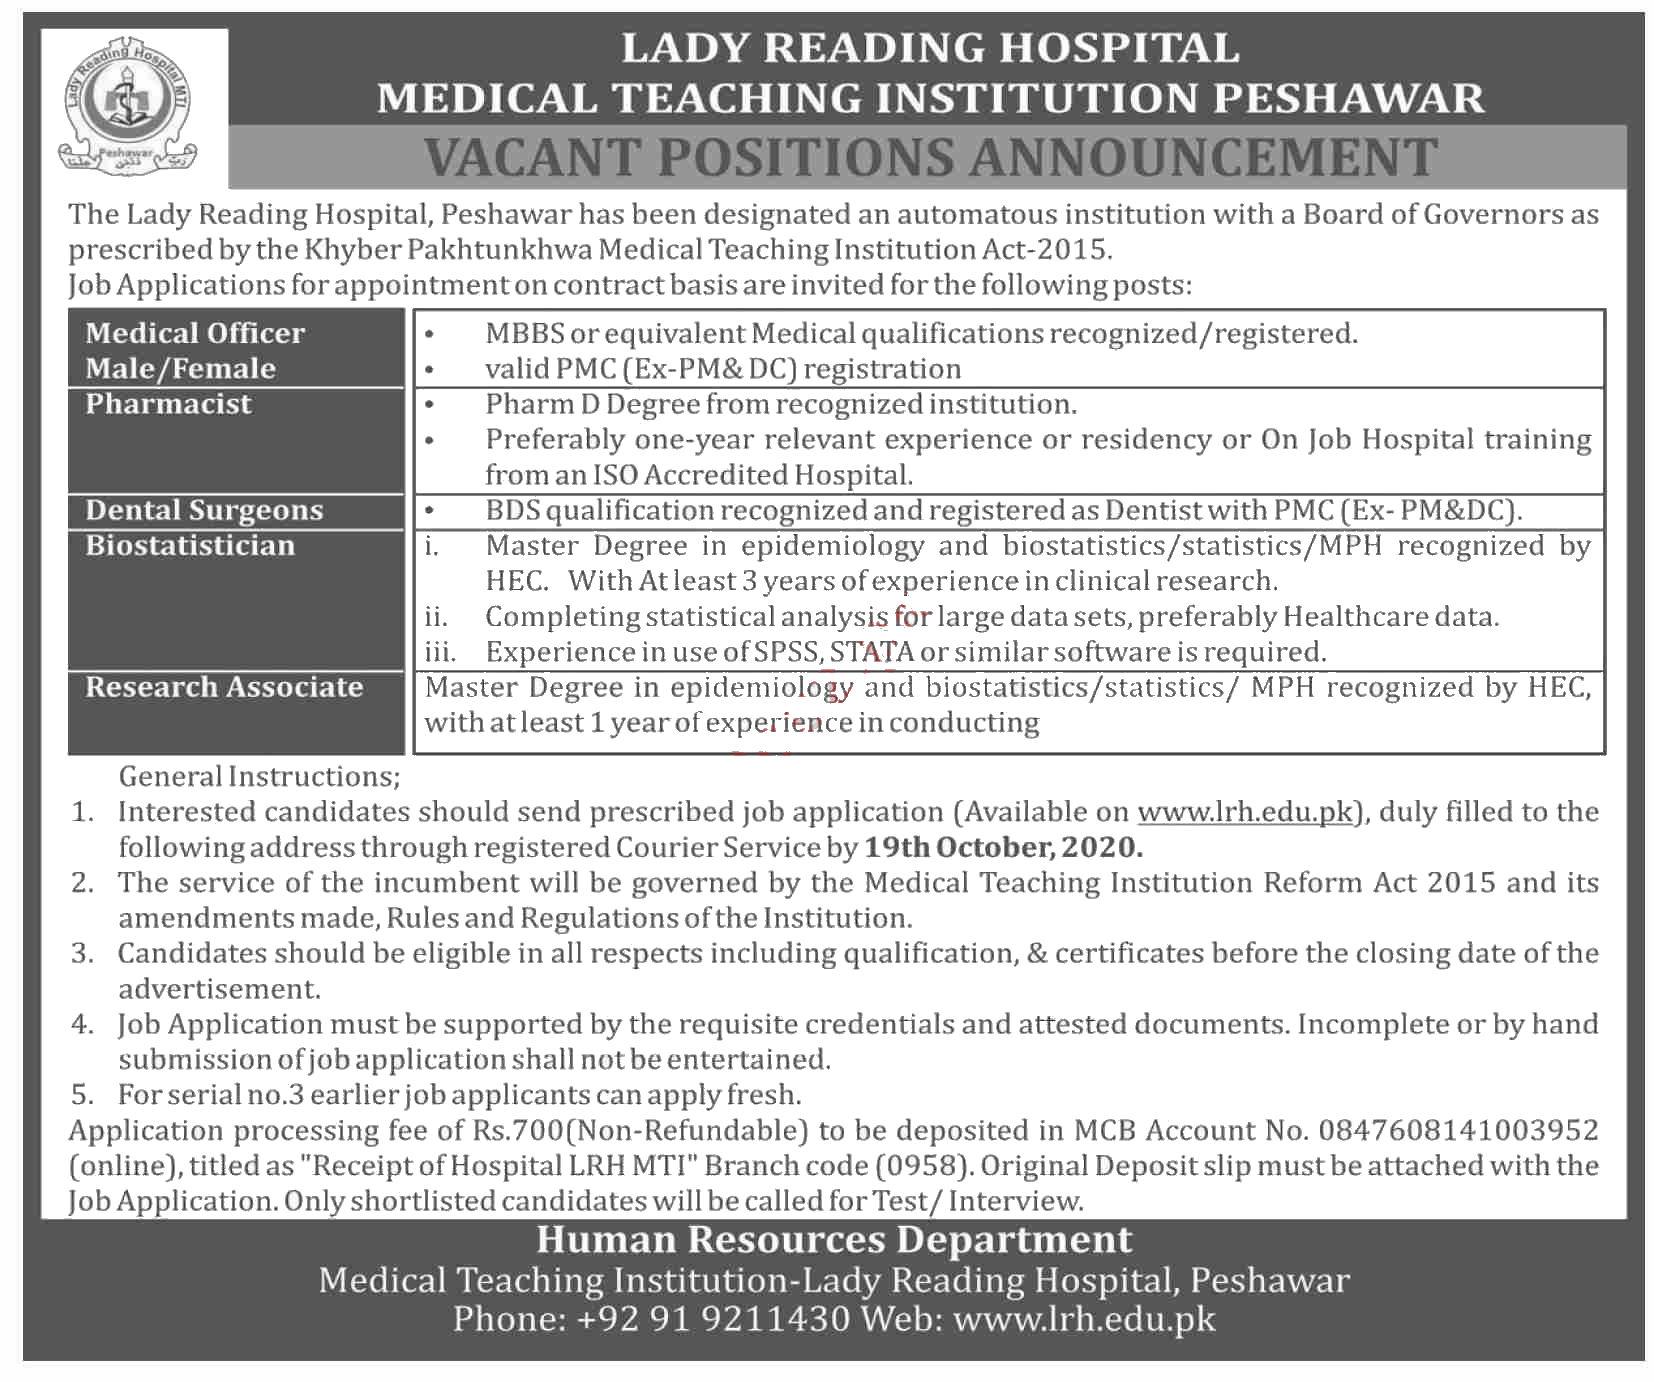 Jobs in Medical Officer & Research Associate in LRH Peshawar 04 October, 2020